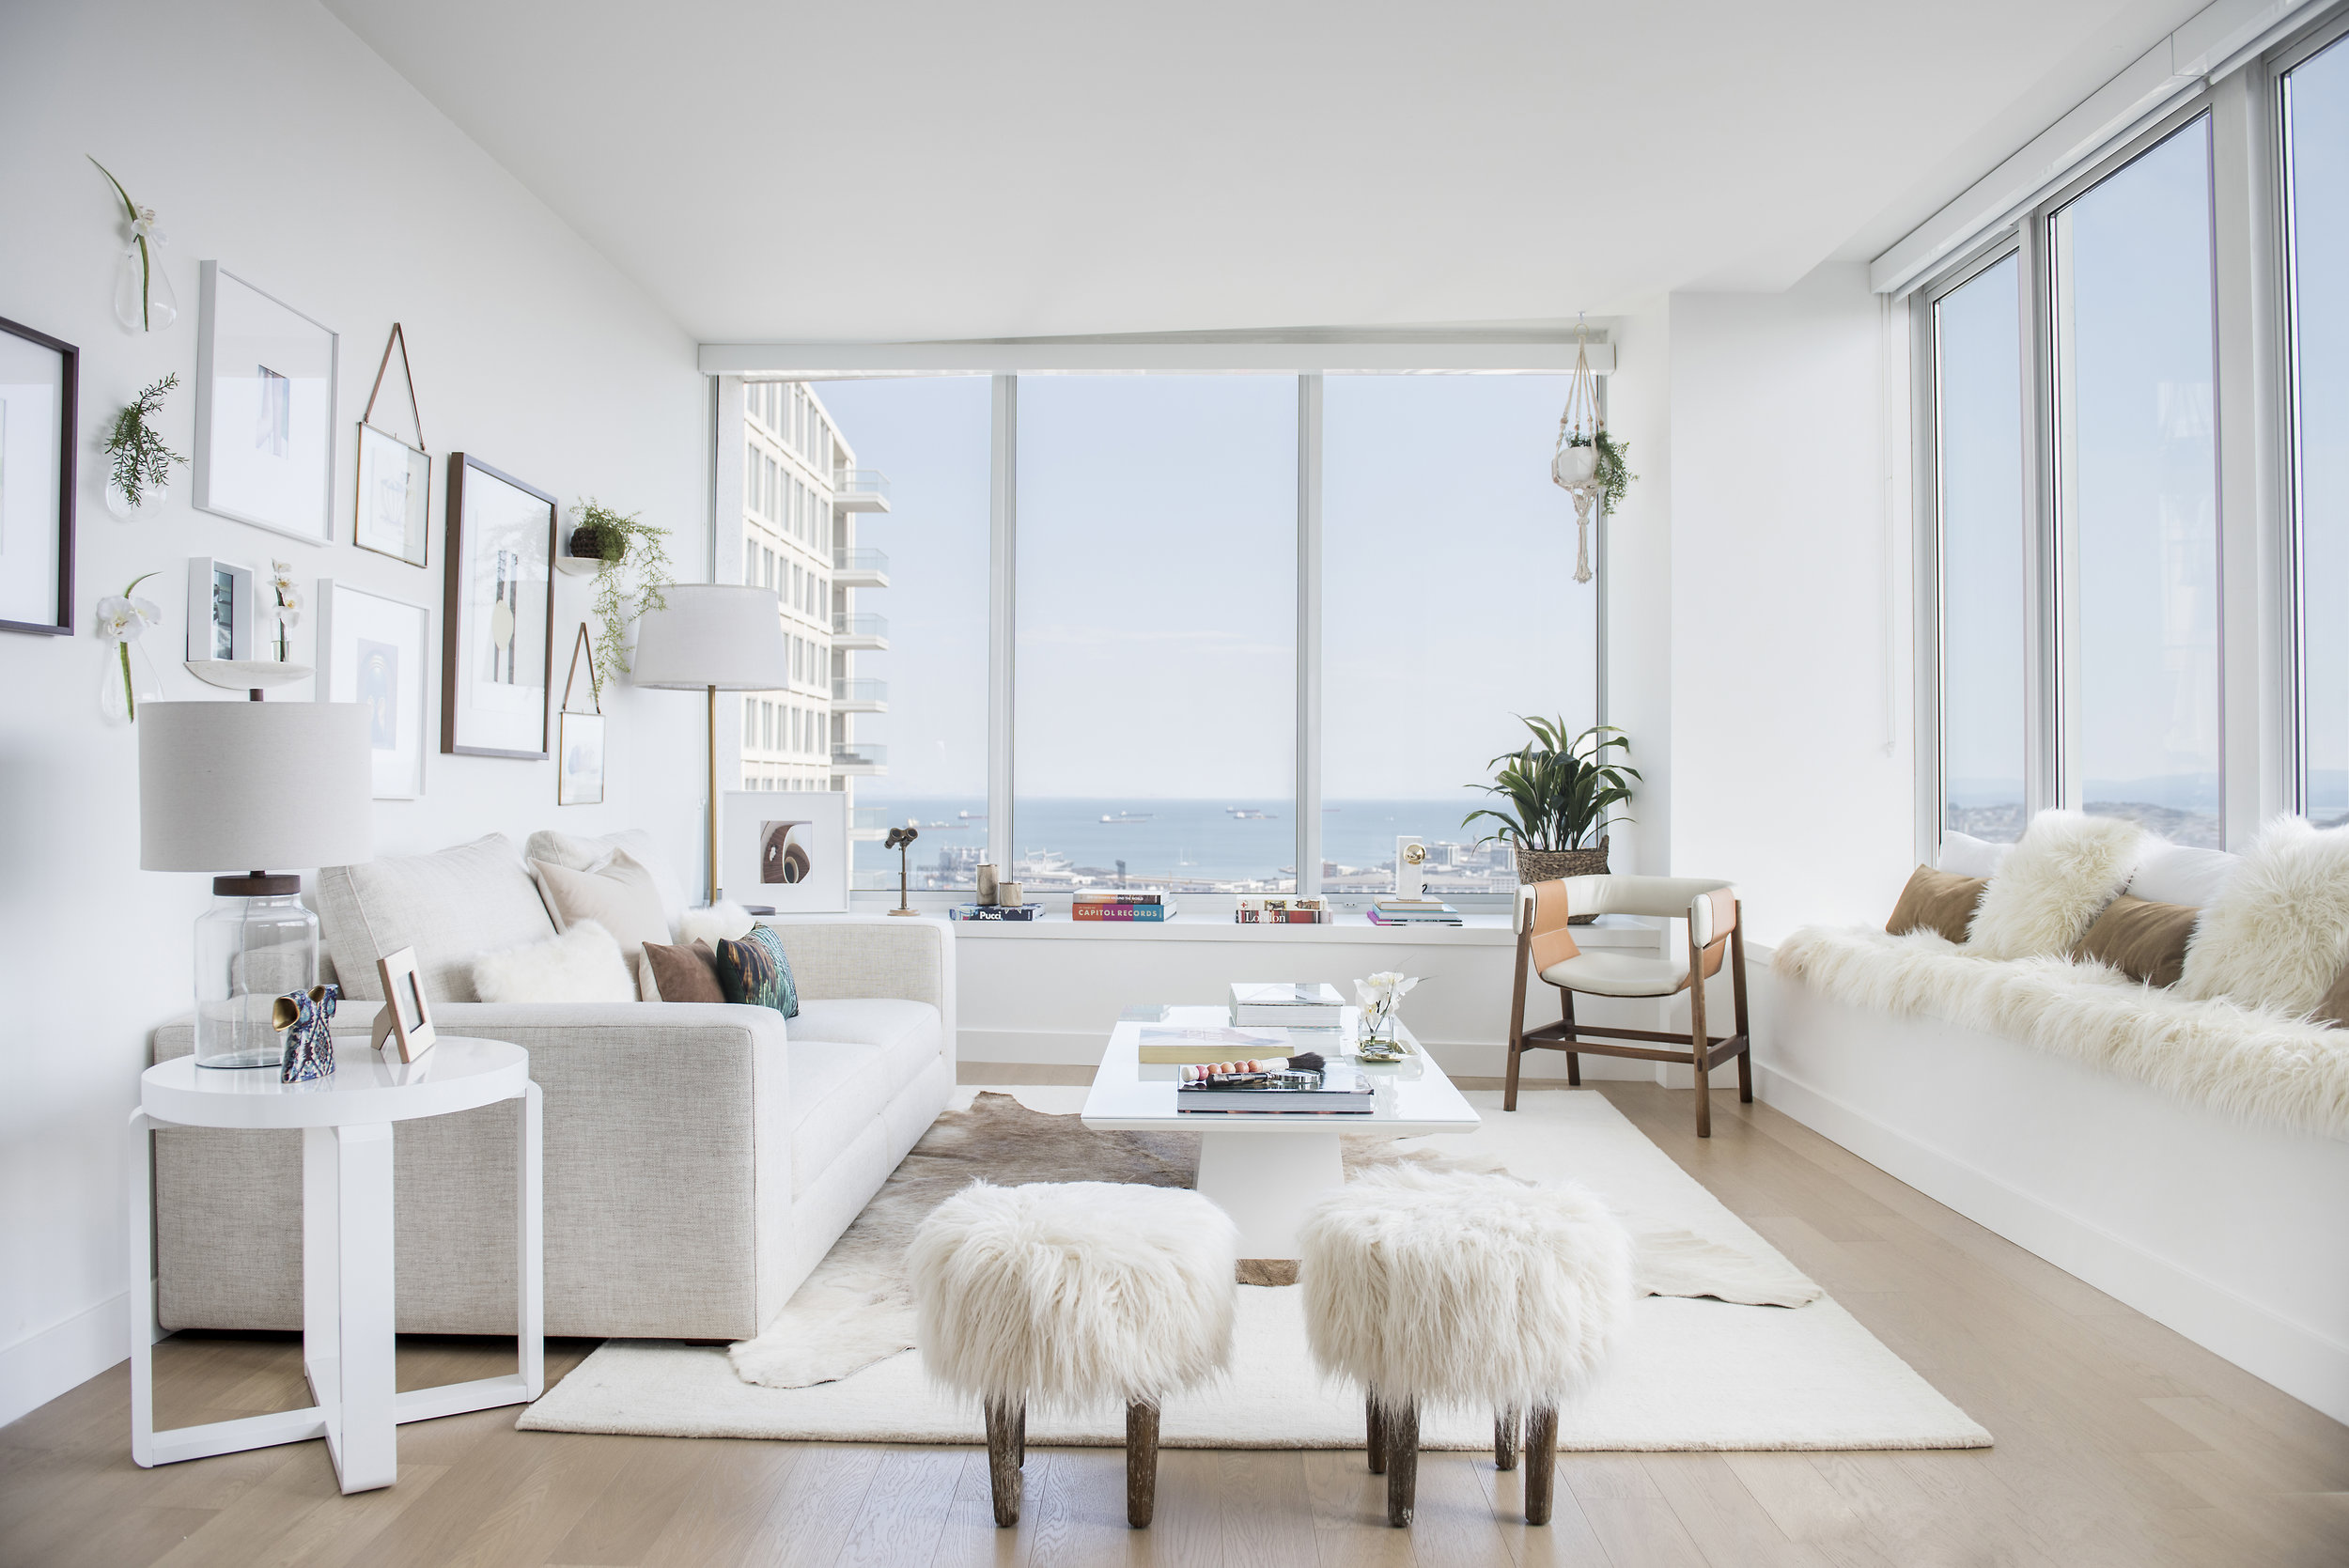 JuliaSperling_Houzz_San Francisco_Apartment_08.jpg